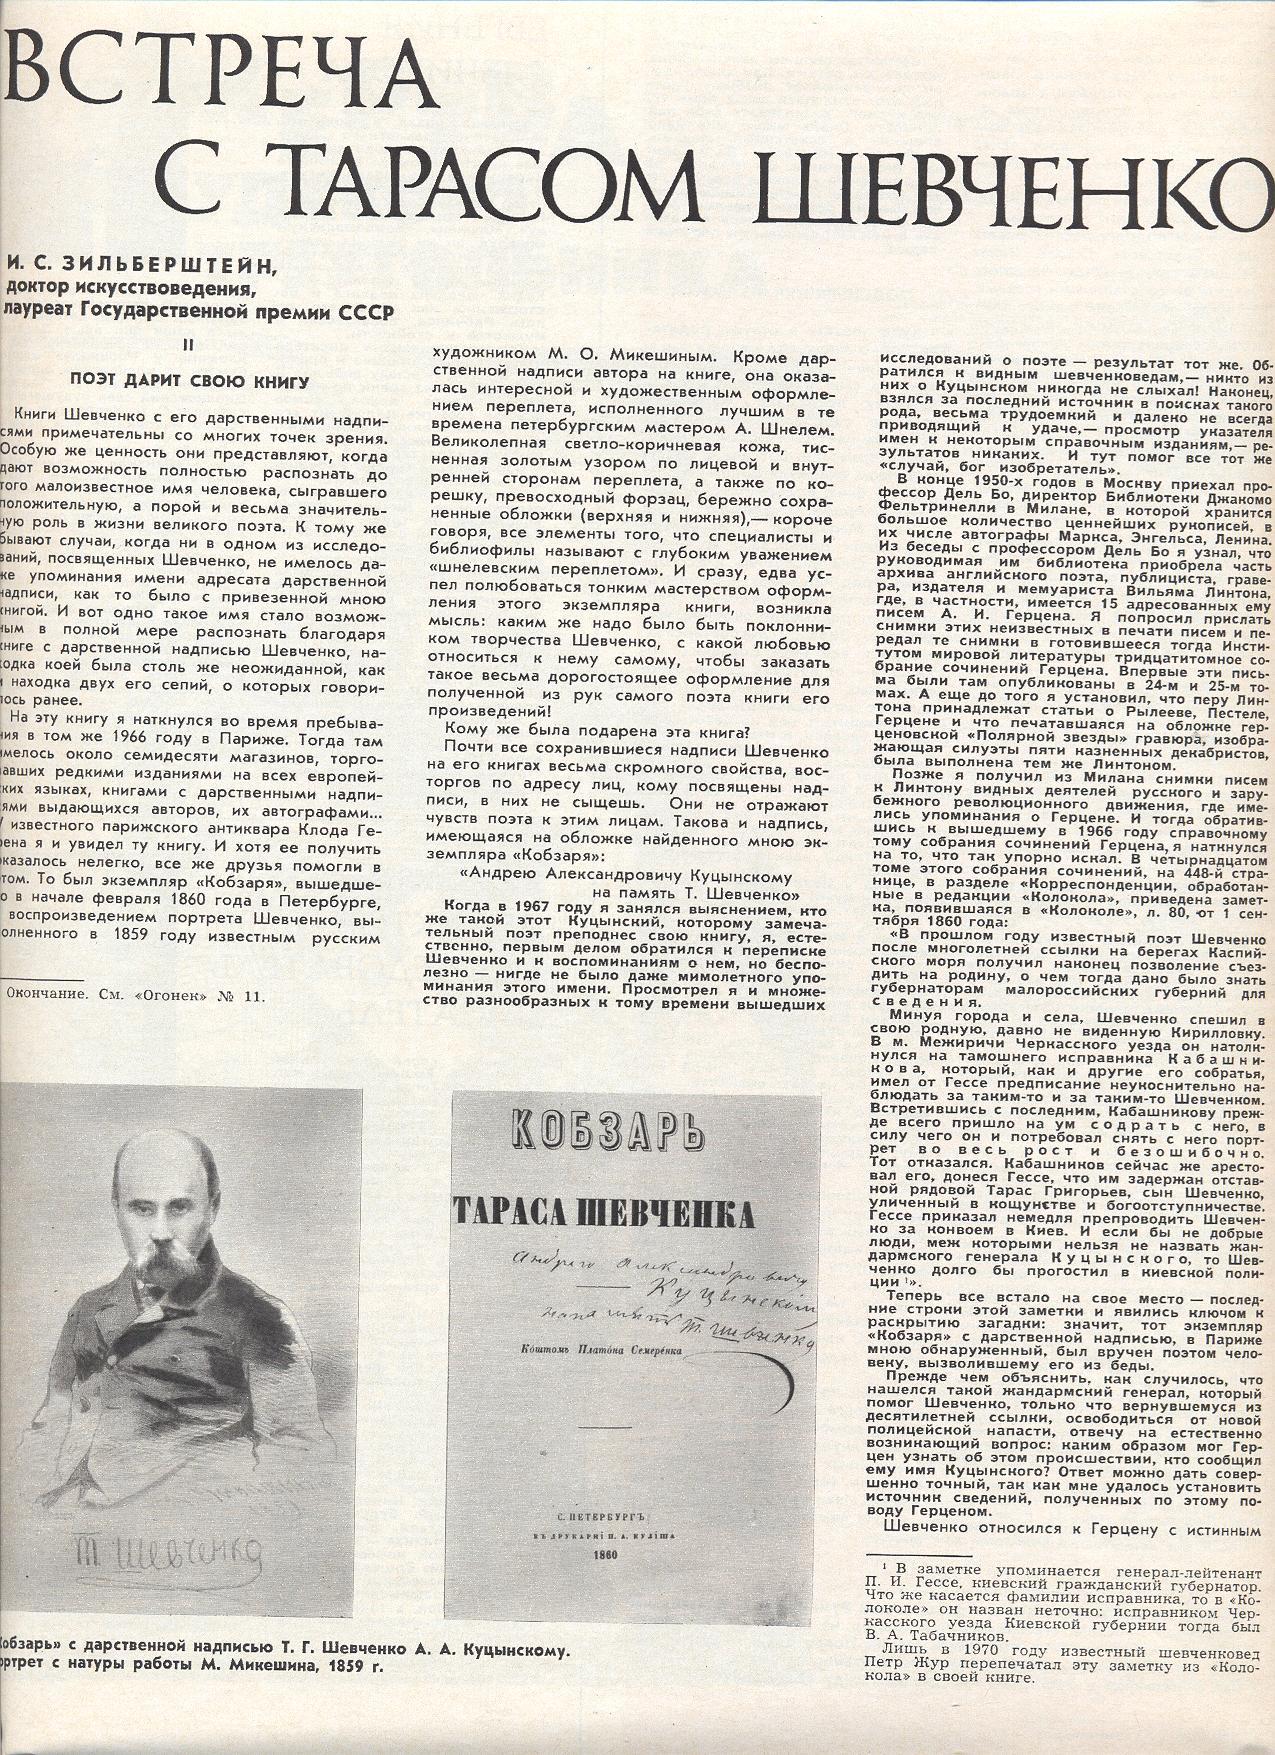 Встреча с Тарасом Шевченко. Зильберштейн